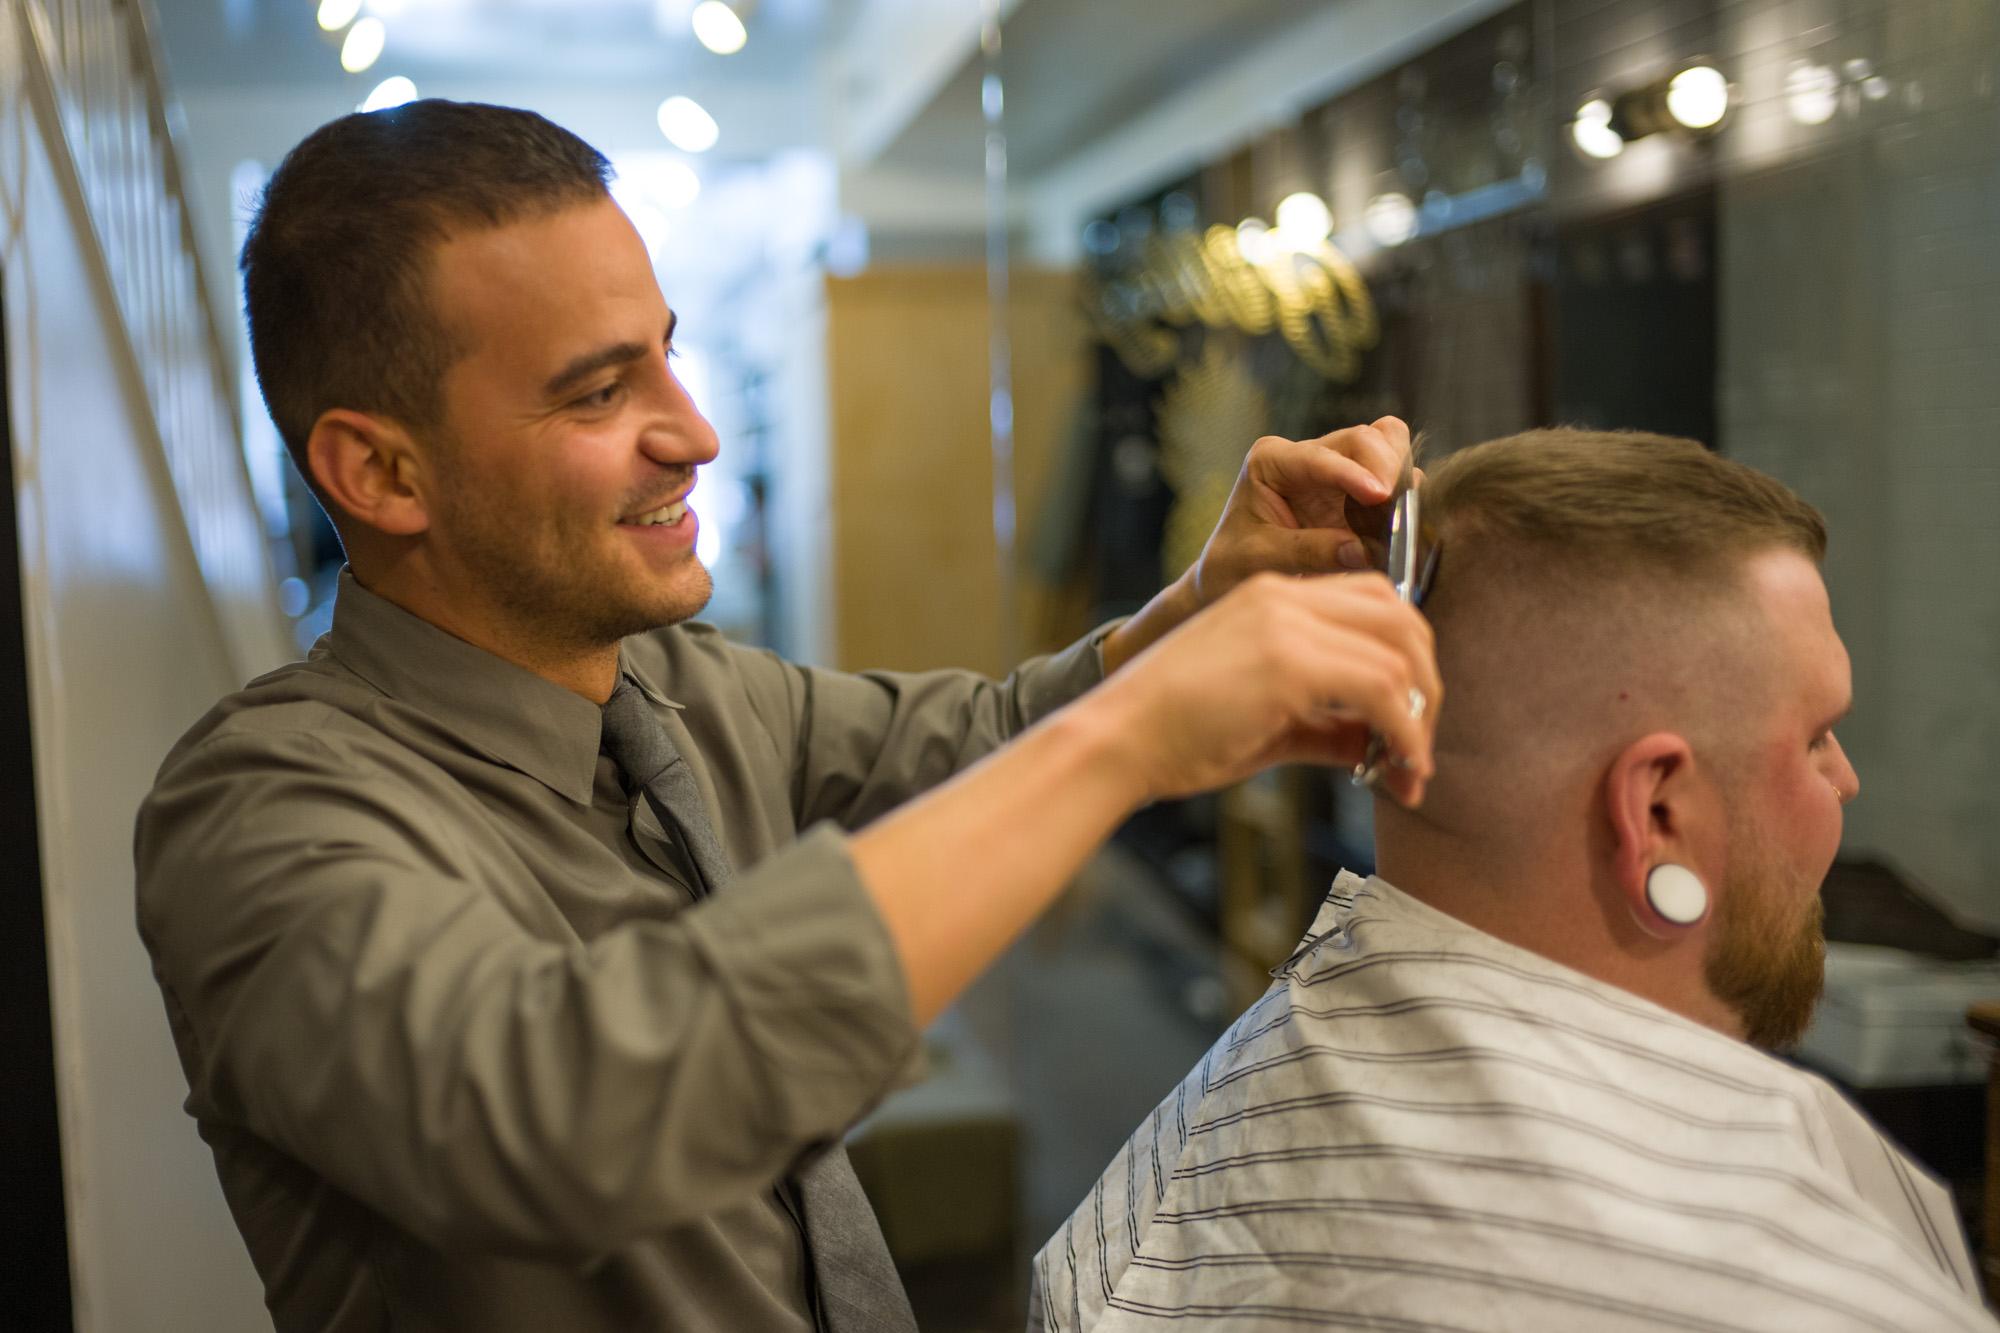 Jorge at work in Billy's Barber Shop